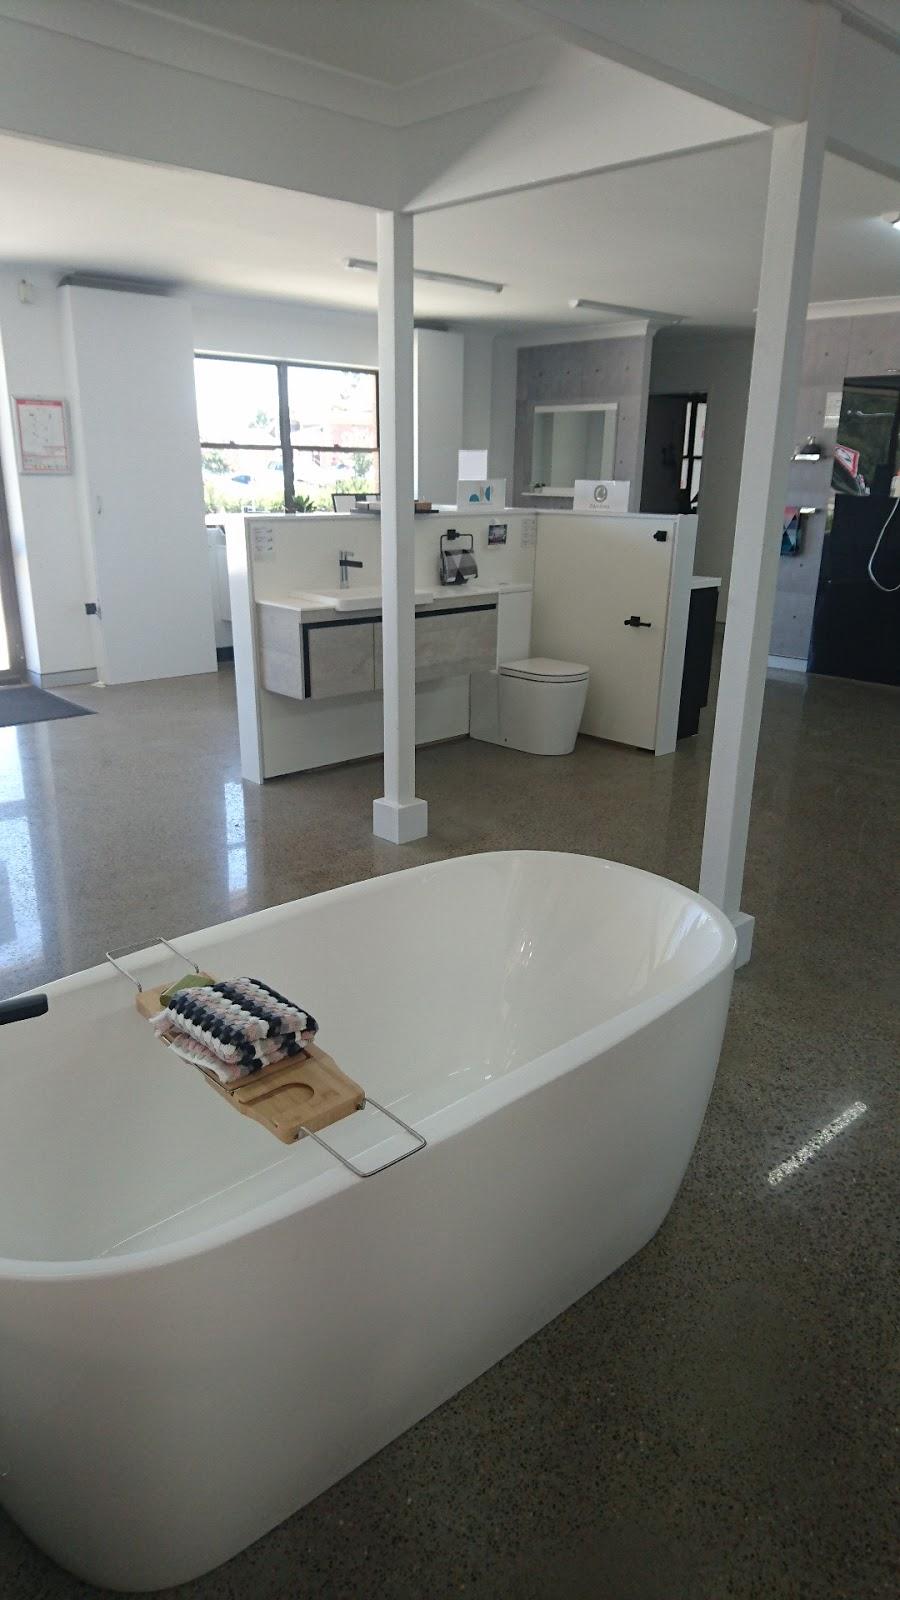 Tradelink   store   Elgin St, Maitland NSW 2320, Australia   0249345266 OR +61 2 4934 5266